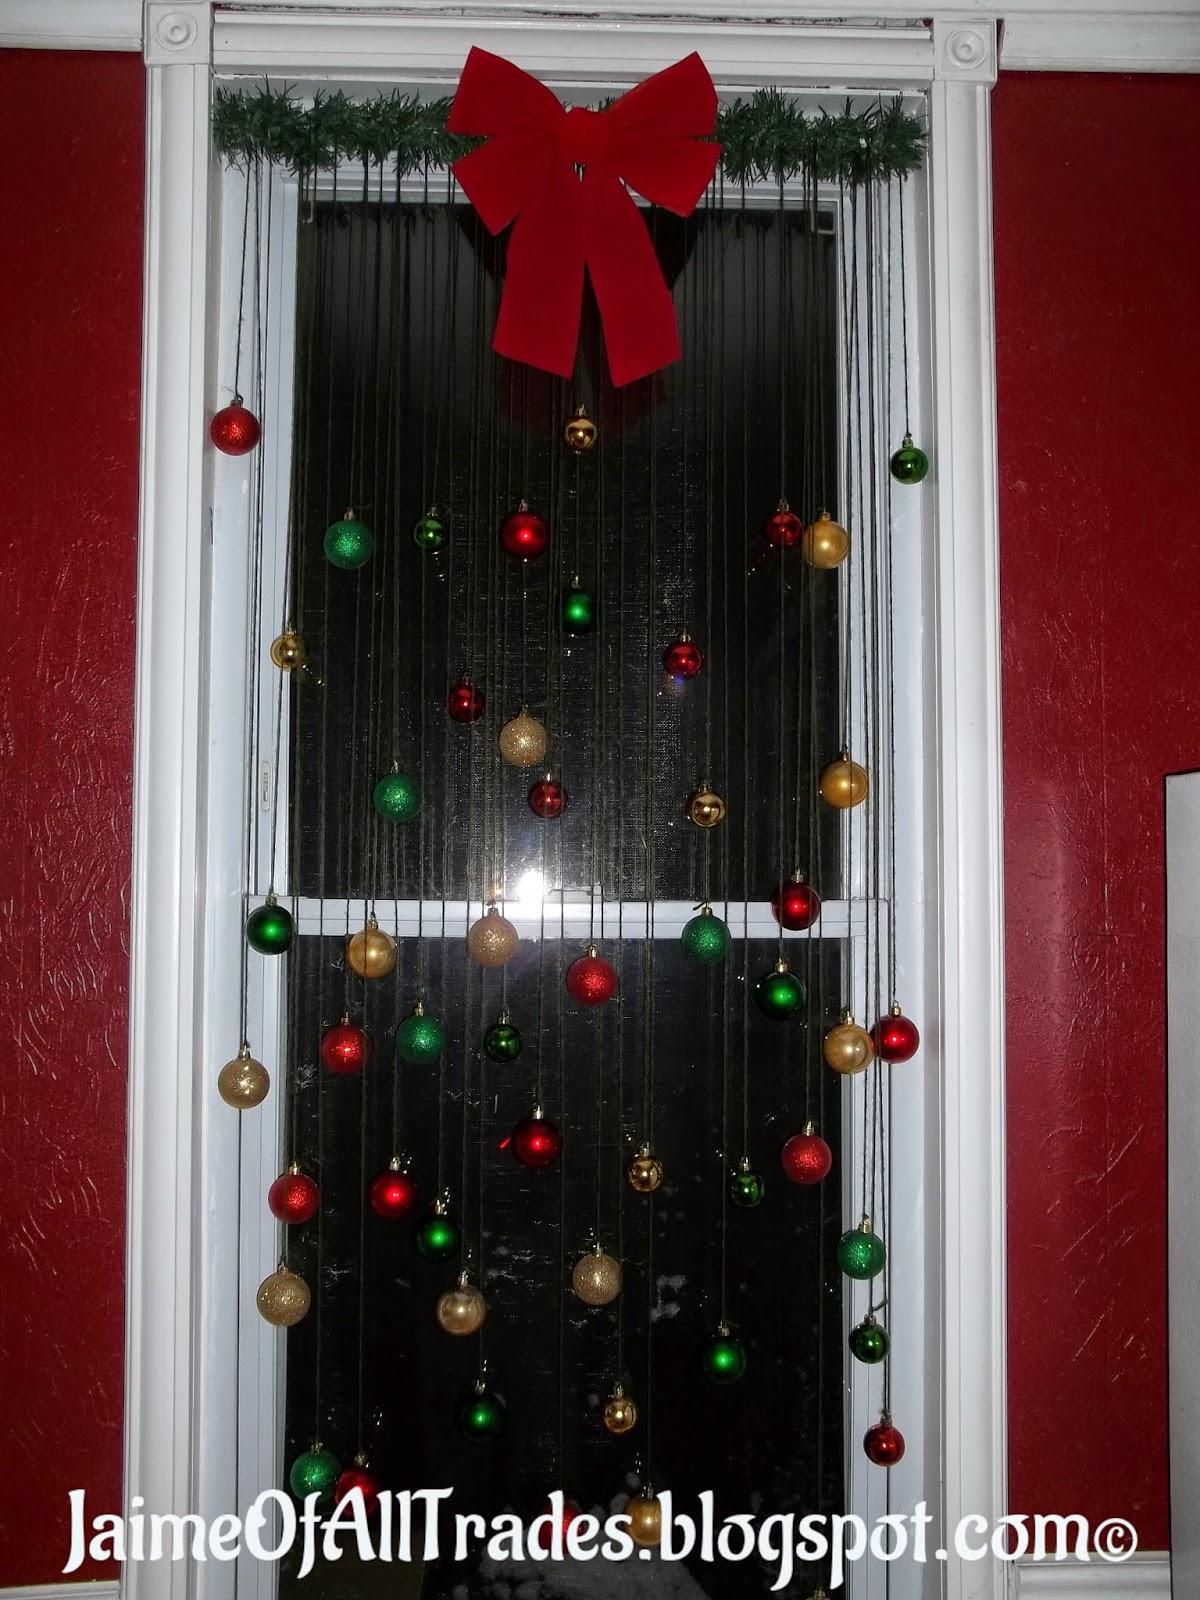 jaime of all trades diy christmas window decorations. Black Bedroom Furniture Sets. Home Design Ideas